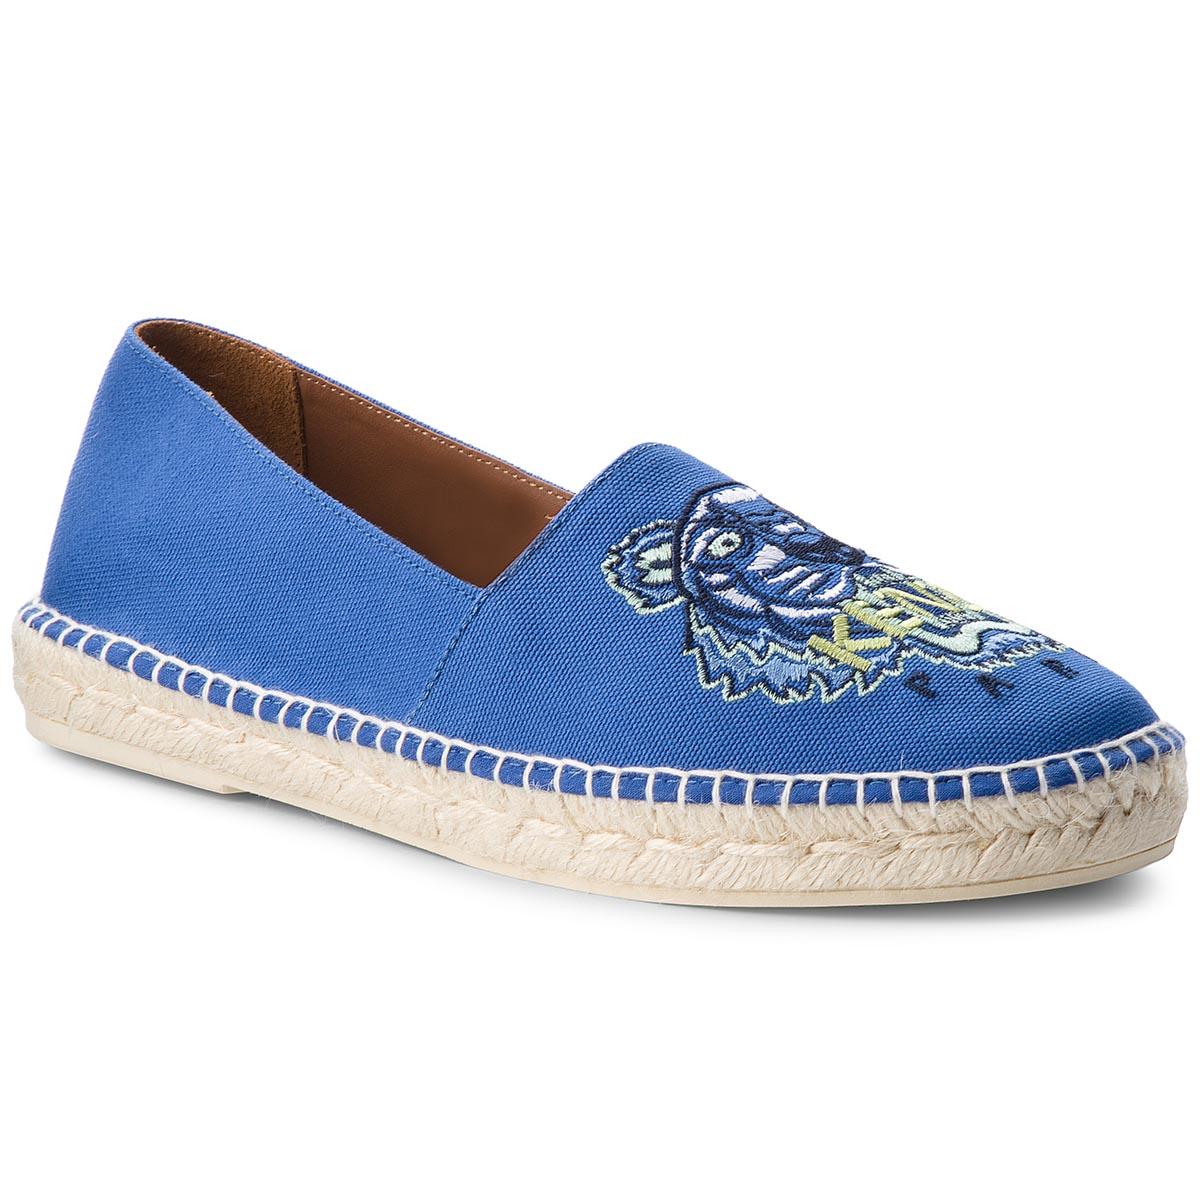 Espadrilky KENZO - F865ES180F70 Bleu France 74 - Glami.cz f0120b9803